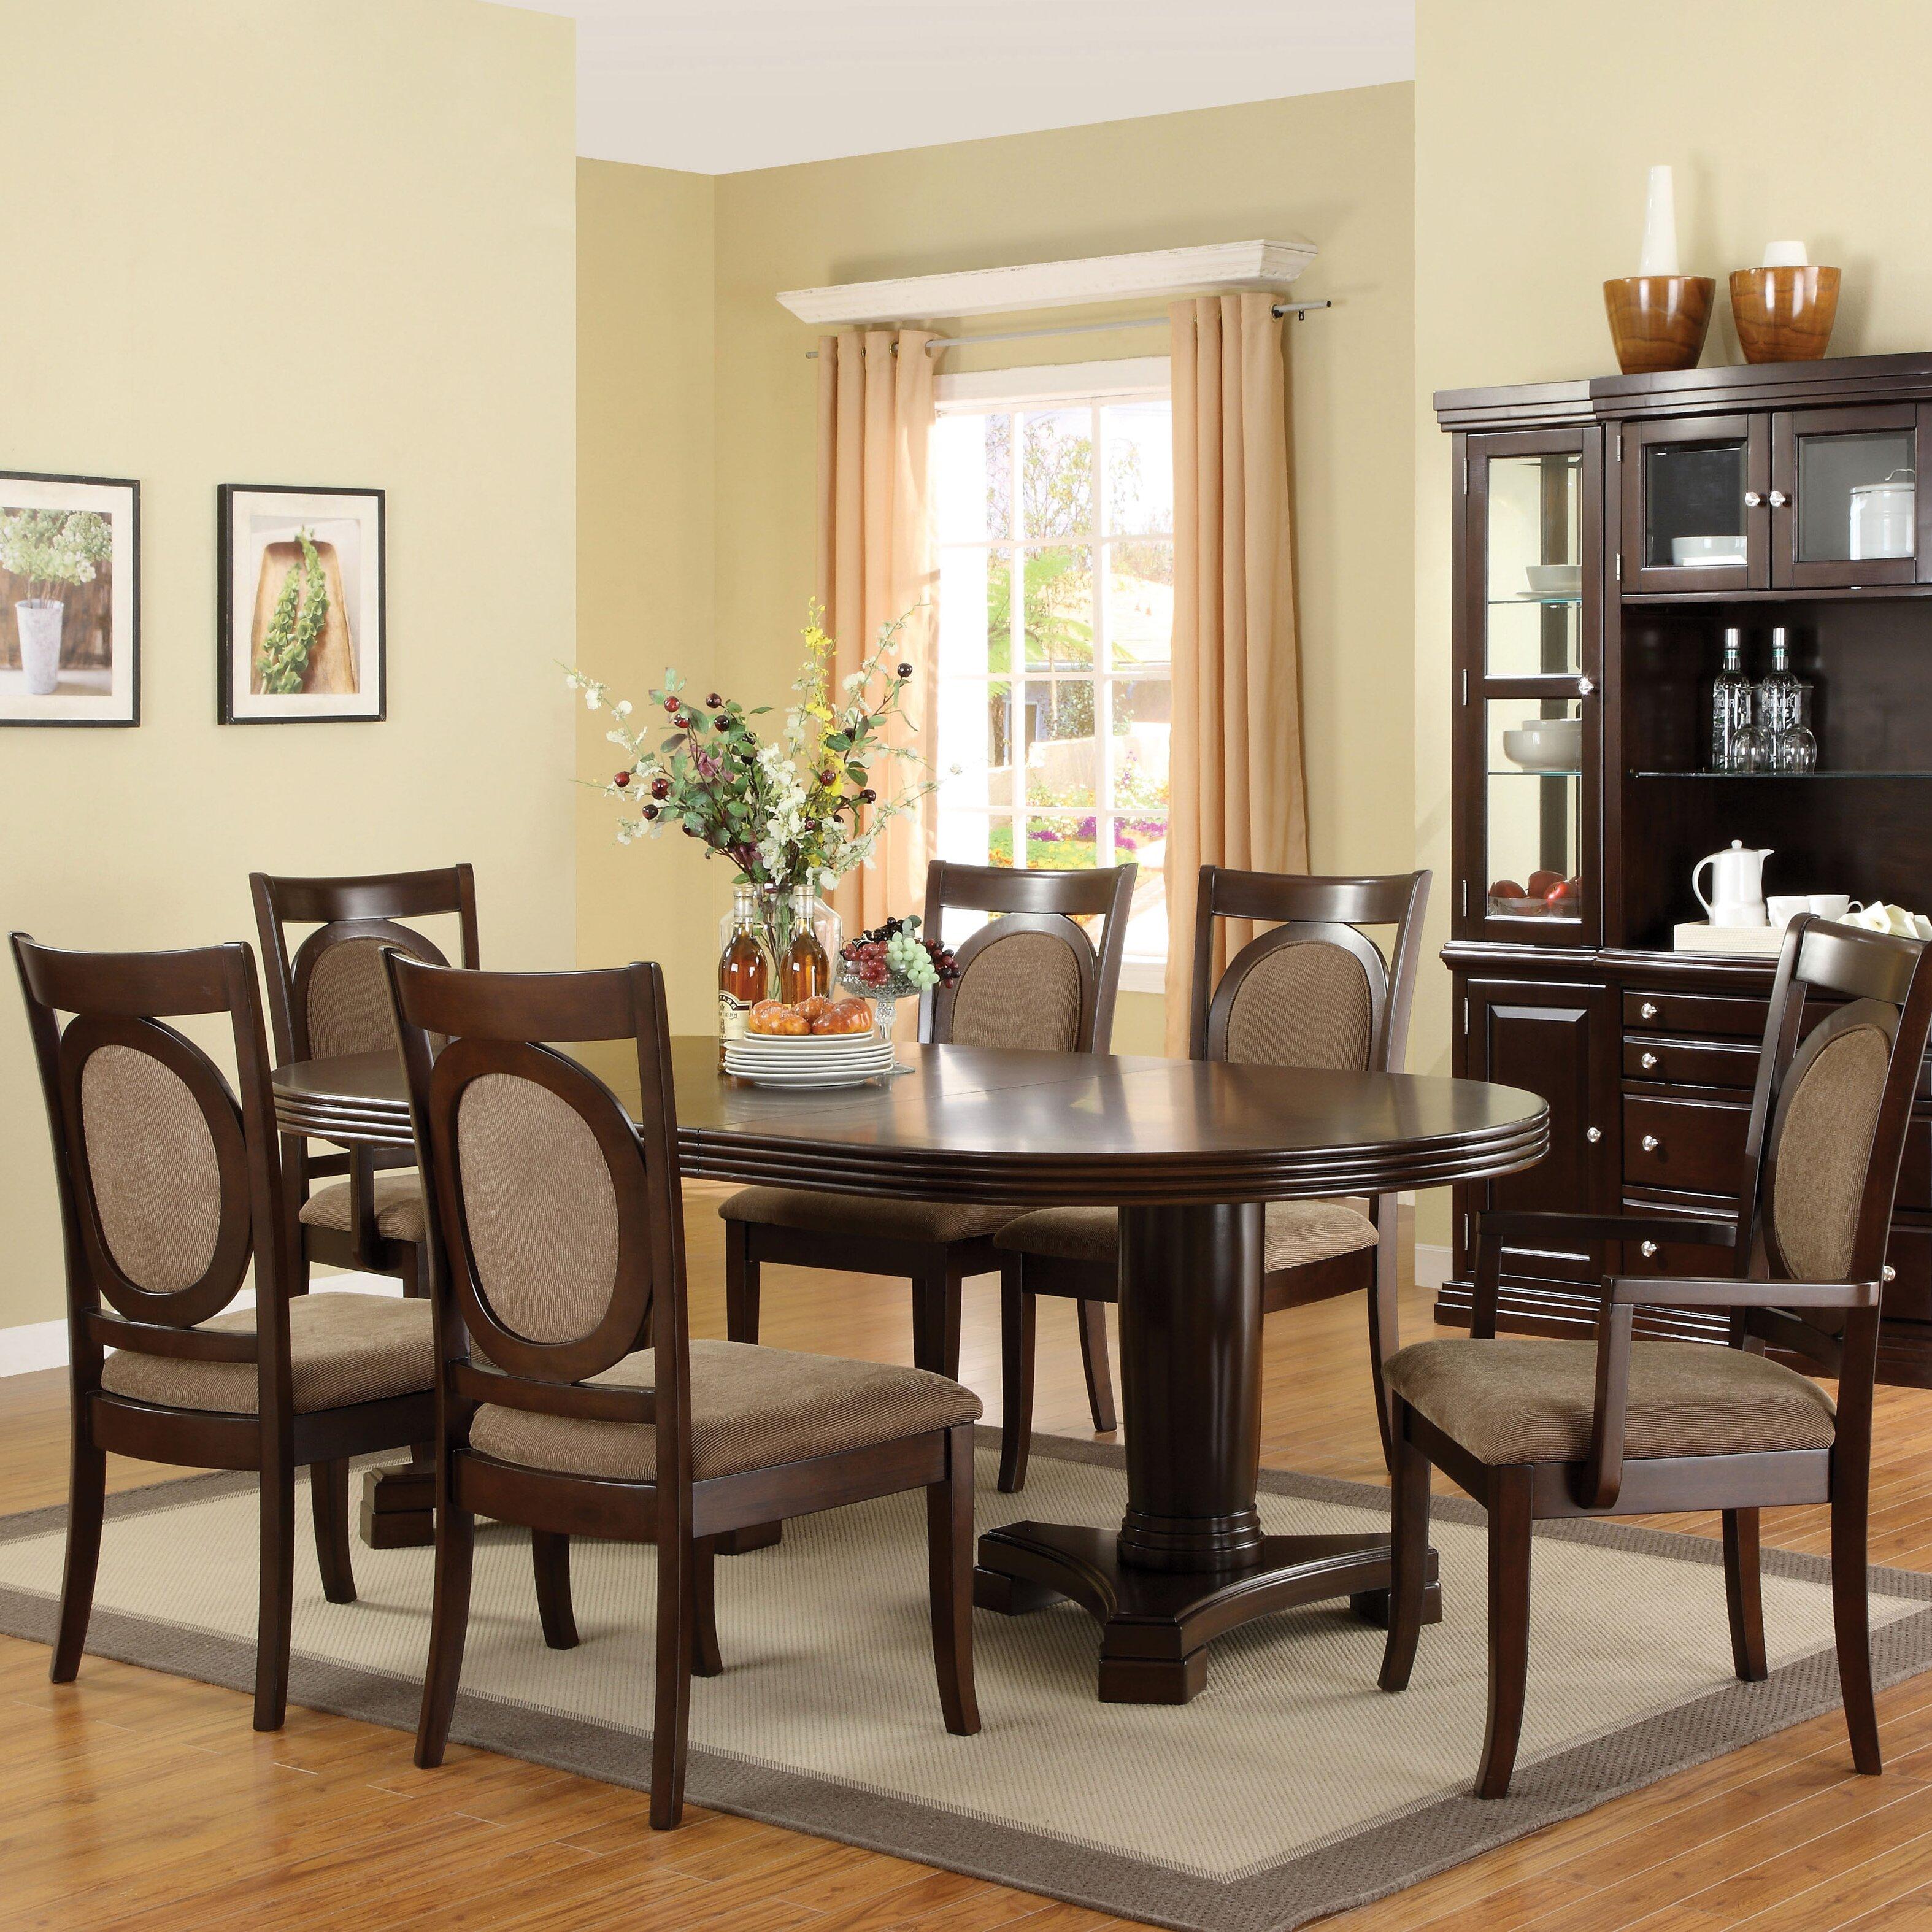 Hokku Designs Hokku Designs Regan Dining Table Reviews Wayfair